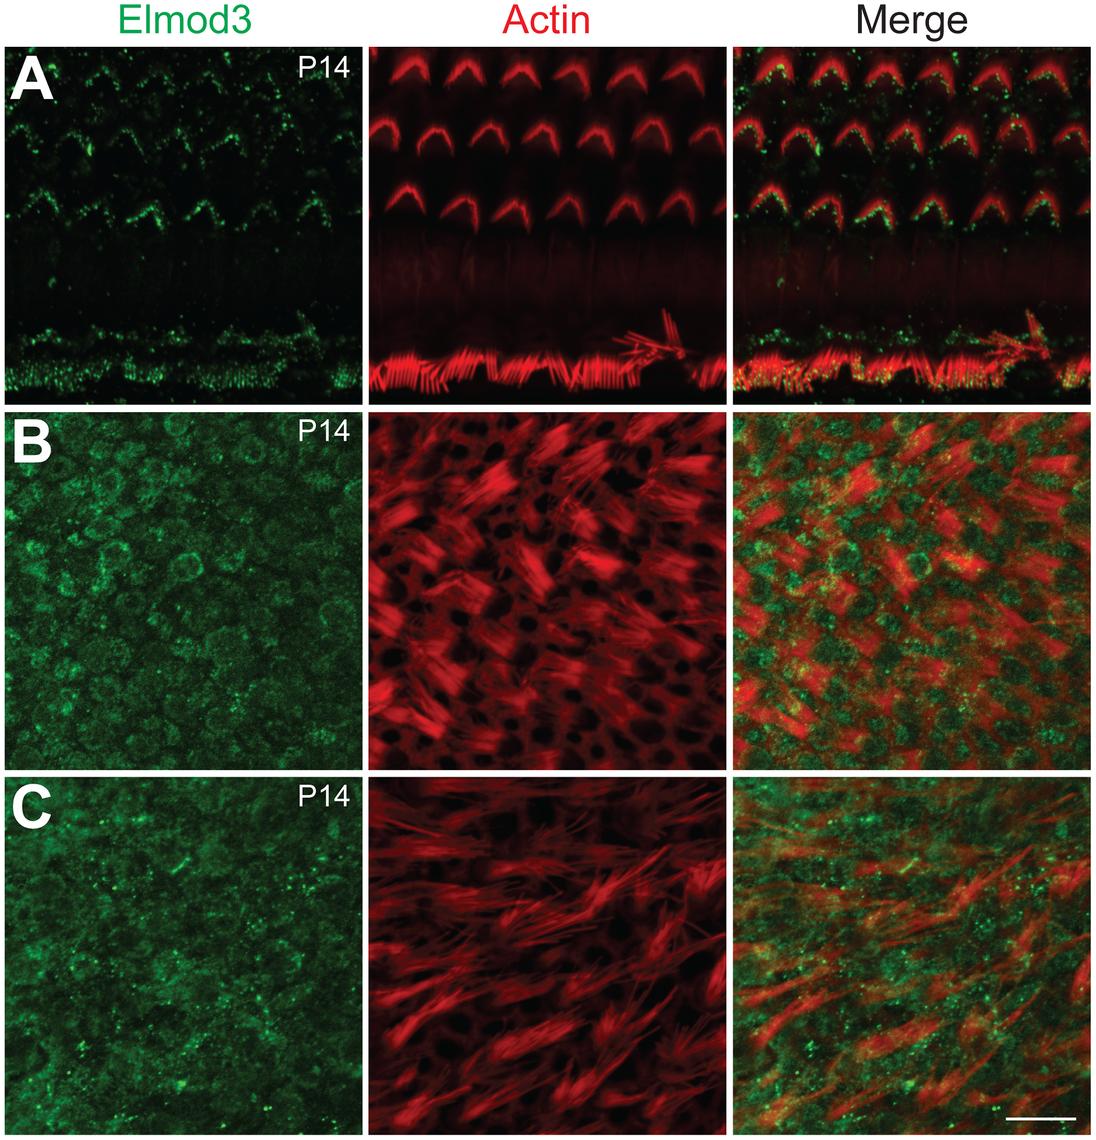 Immunolocalization of ELMOD3 in the mouse organ of Corti and vestibular sensory epithelia.